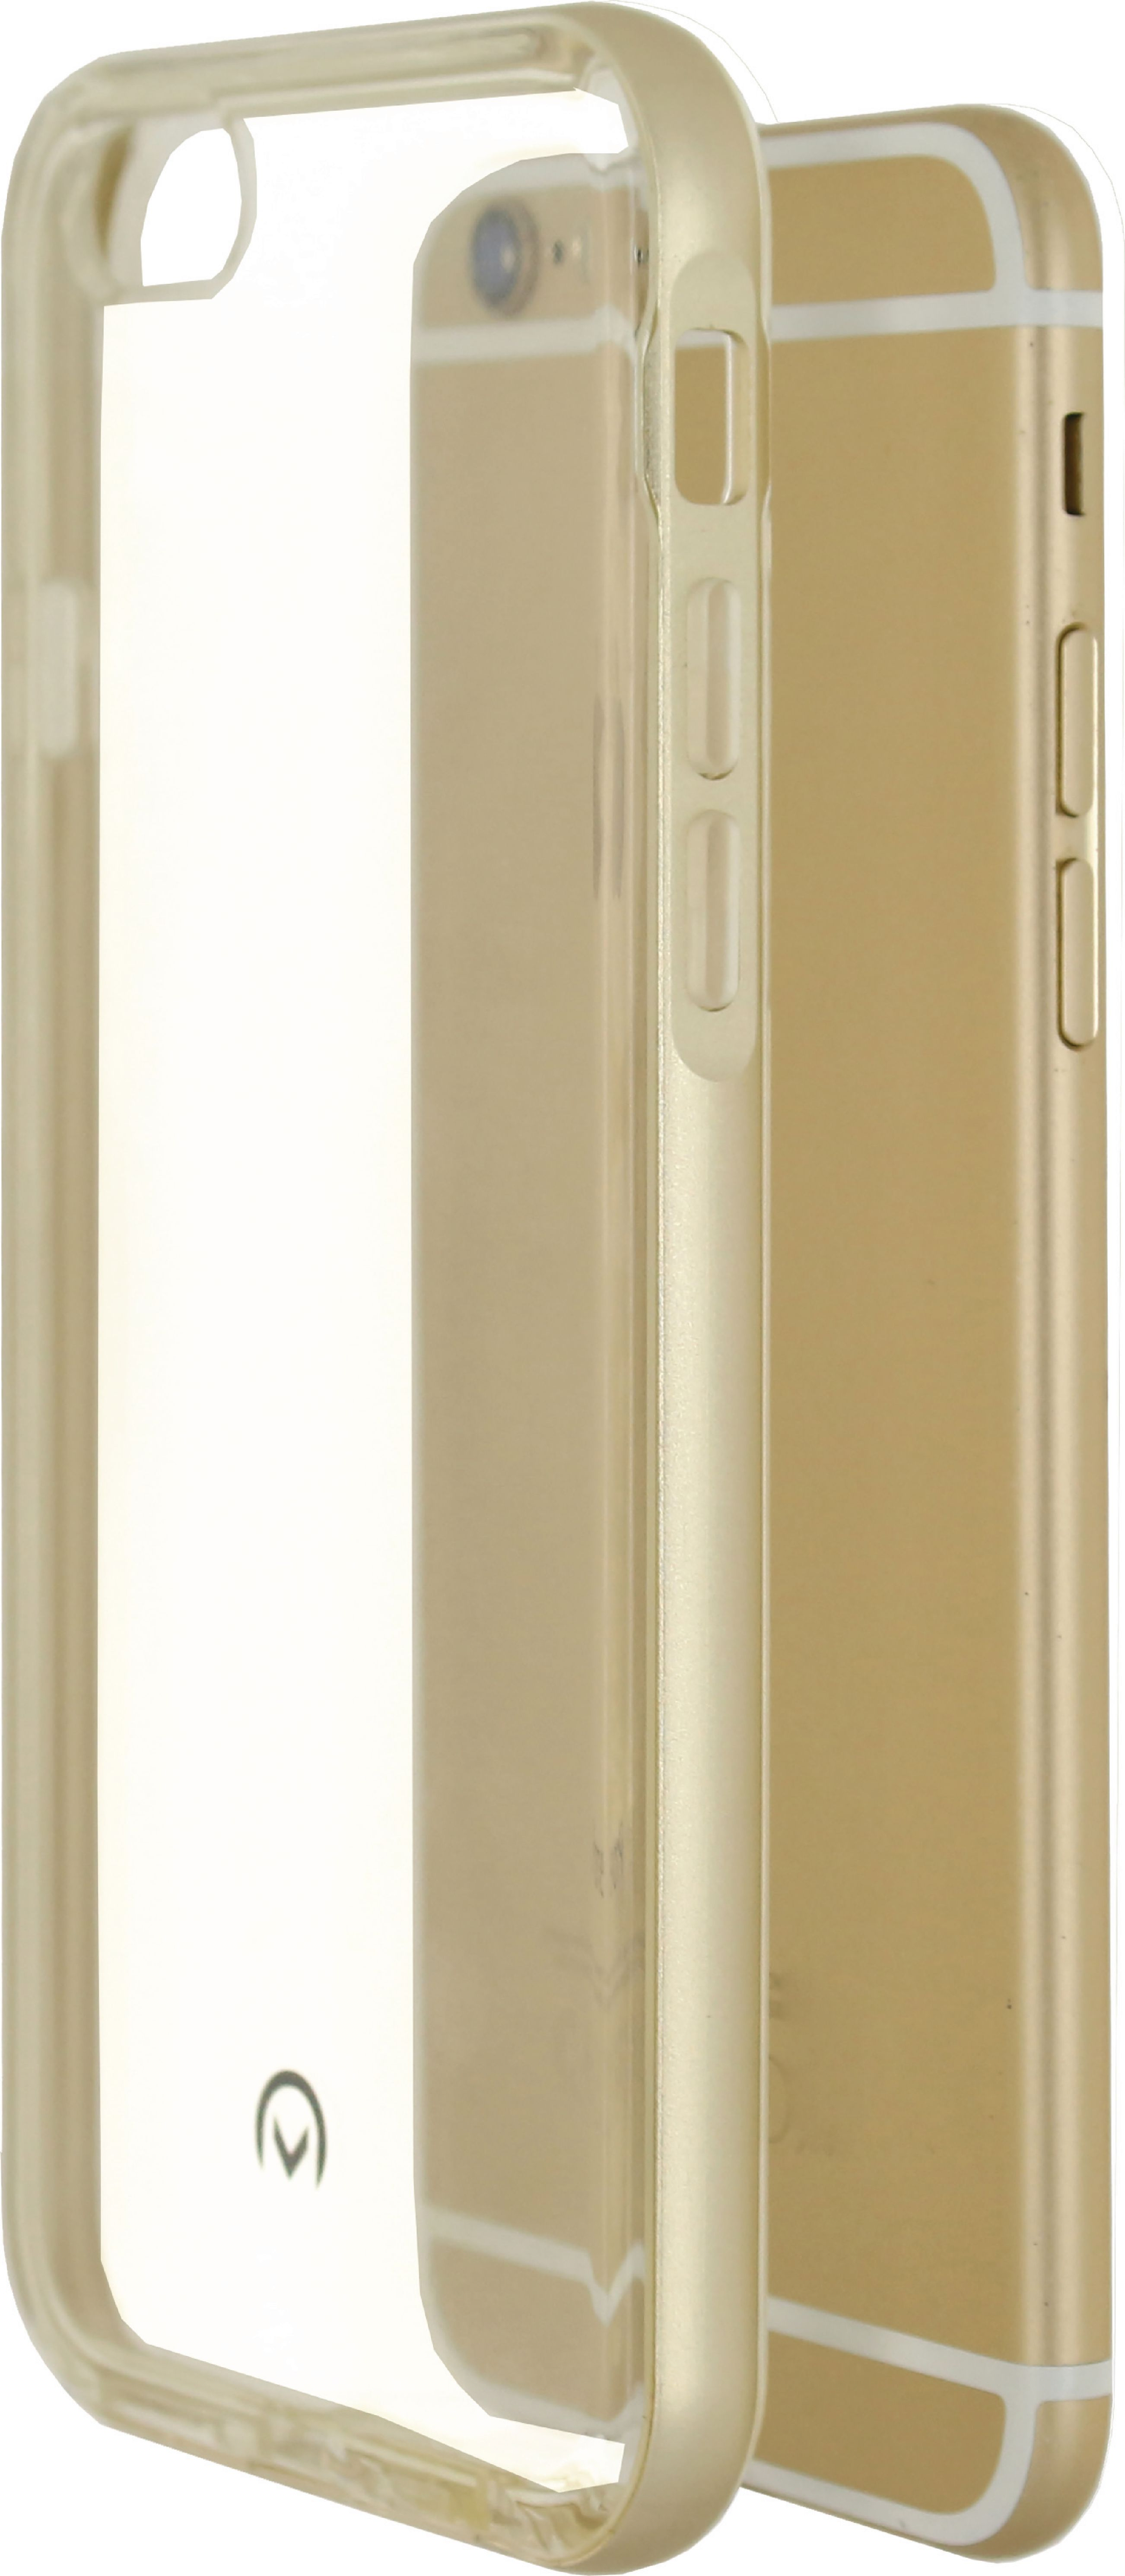 Image of   Telefon Gelly+ Etui Apple iPhone 6 / 6s Guld